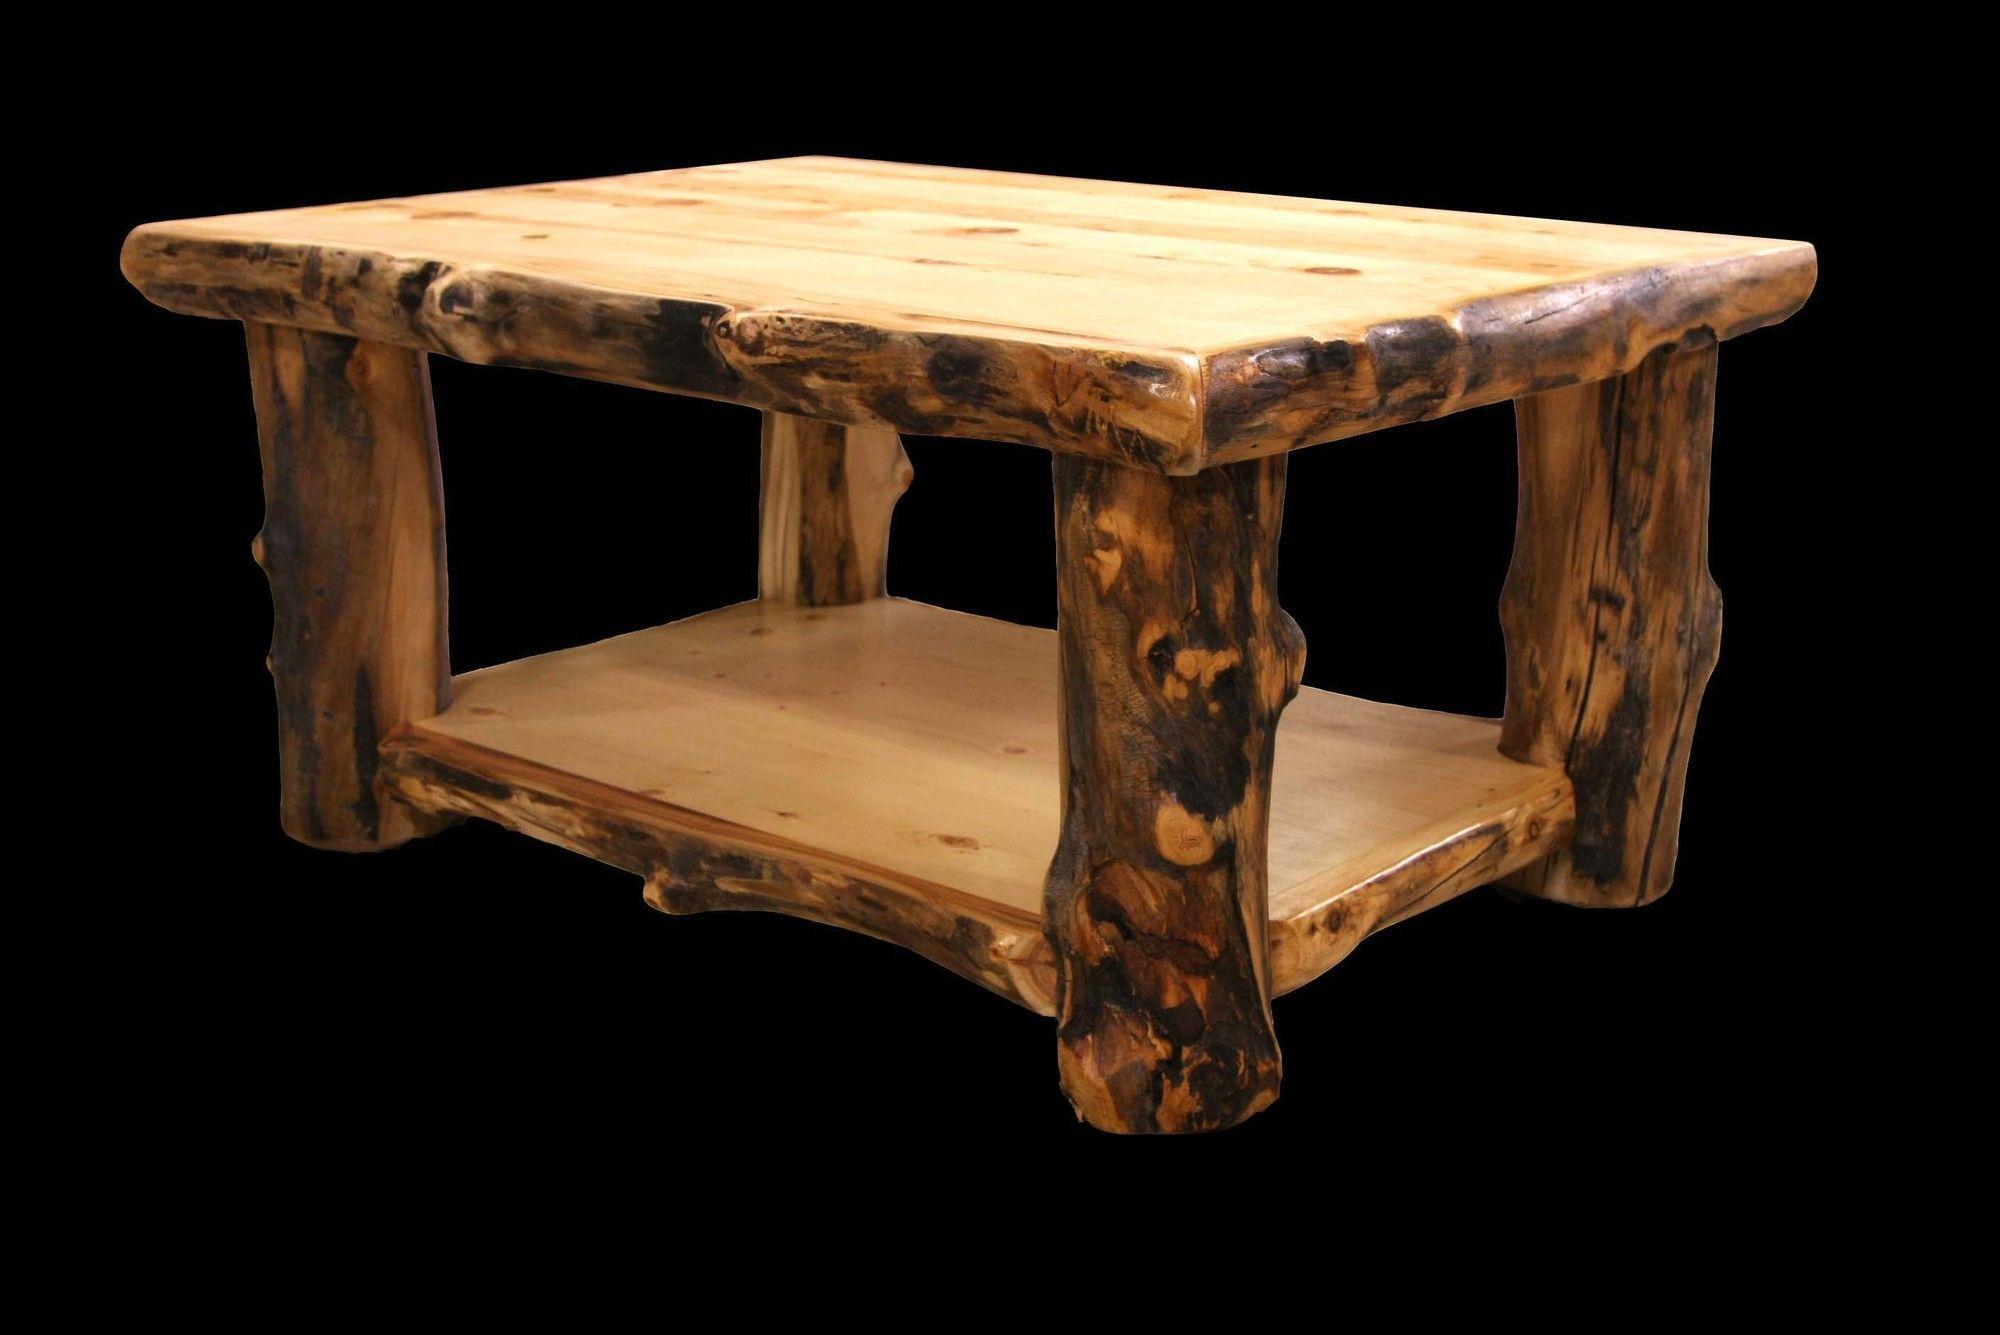 Aspen Coffee Table with Shelf